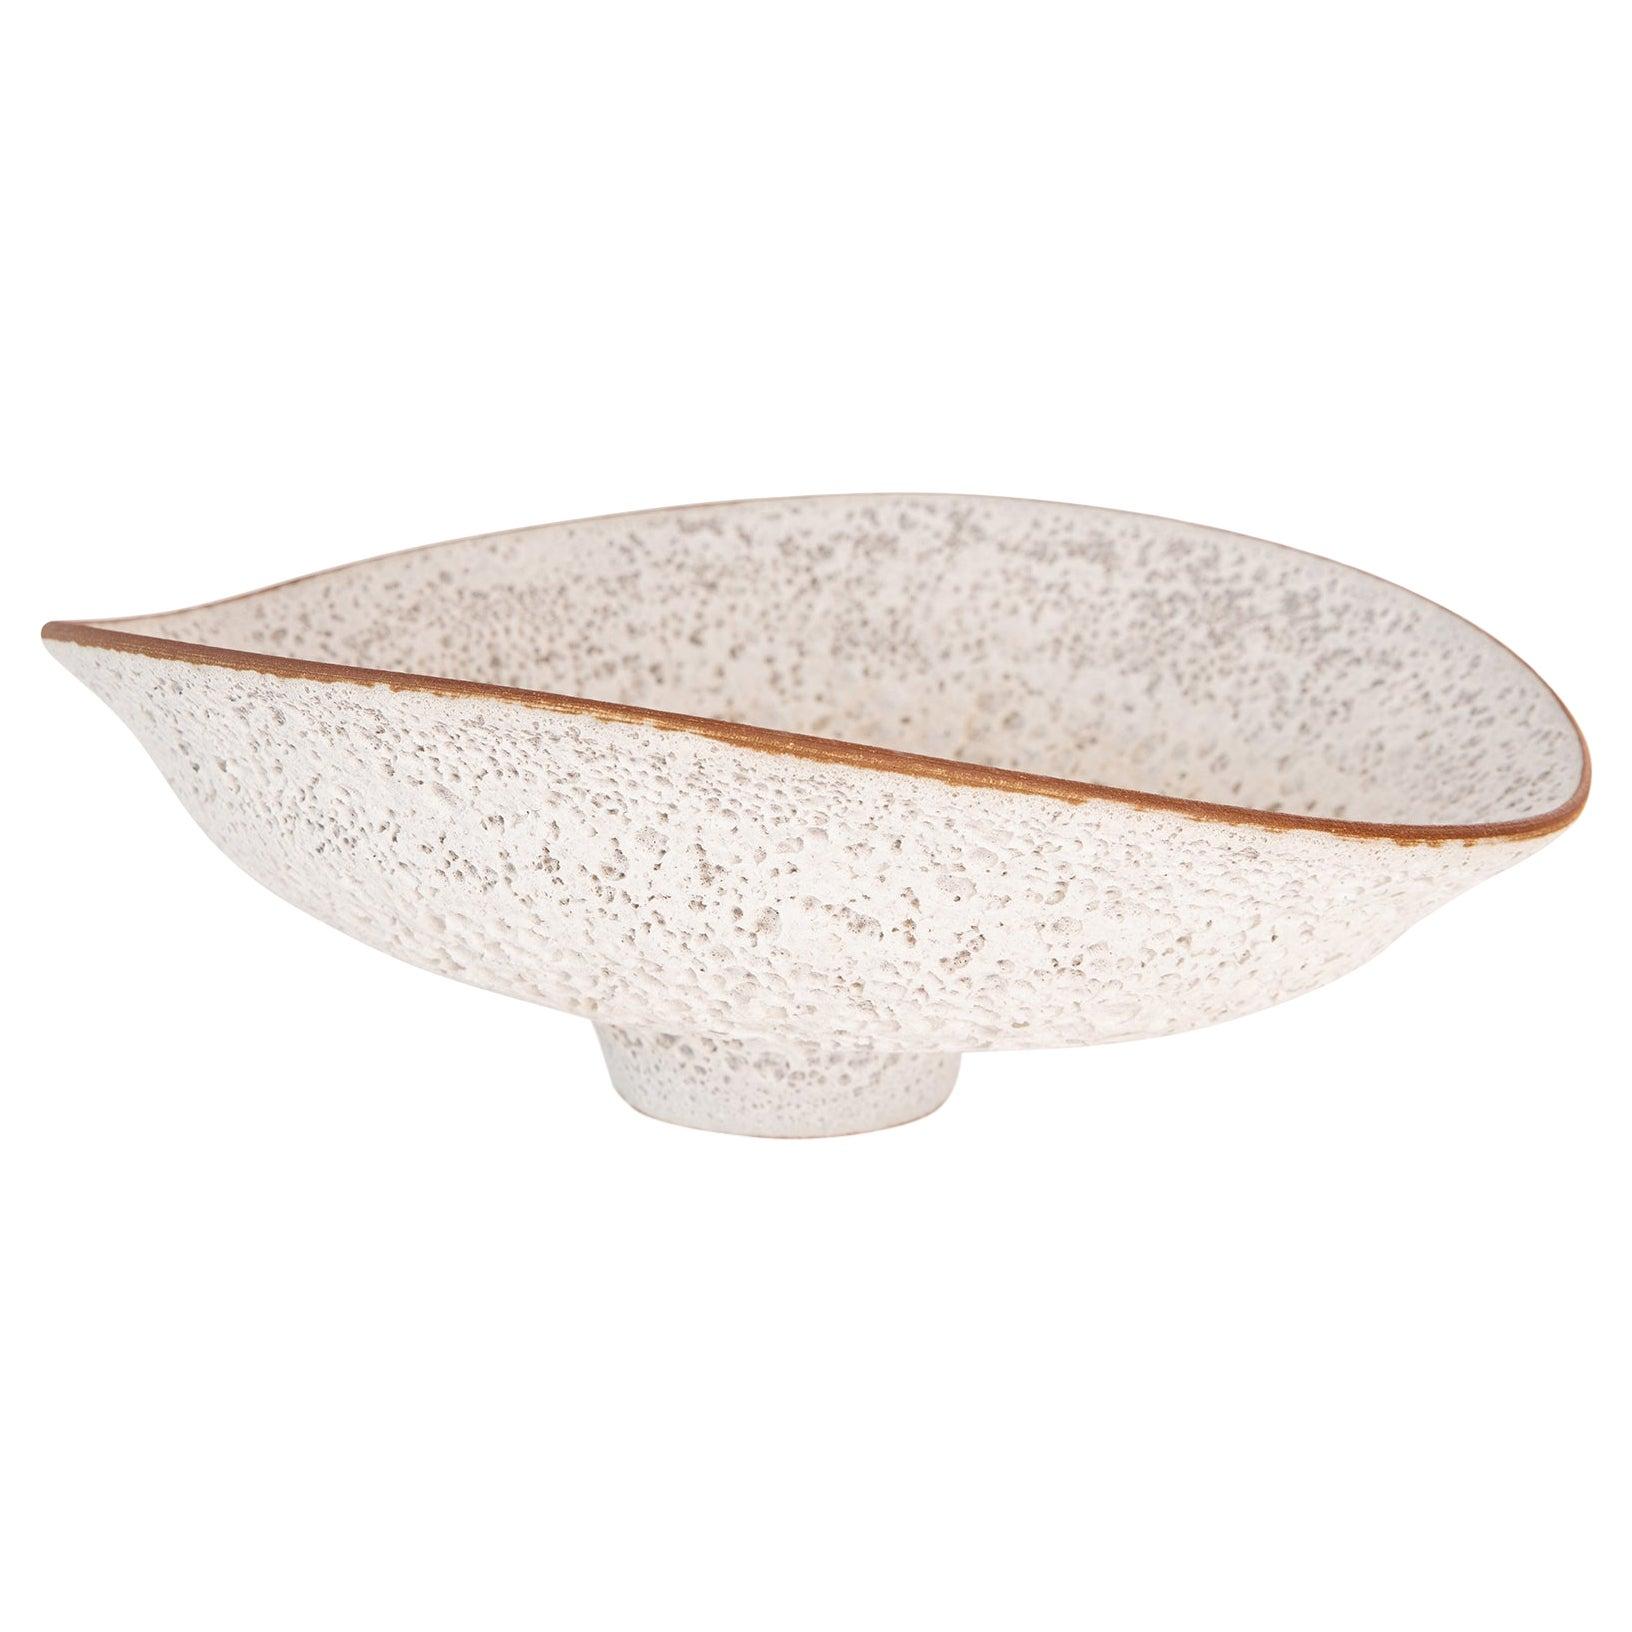 Jeremy Briddell Large Volcanic Glaze Ceramic Bowl